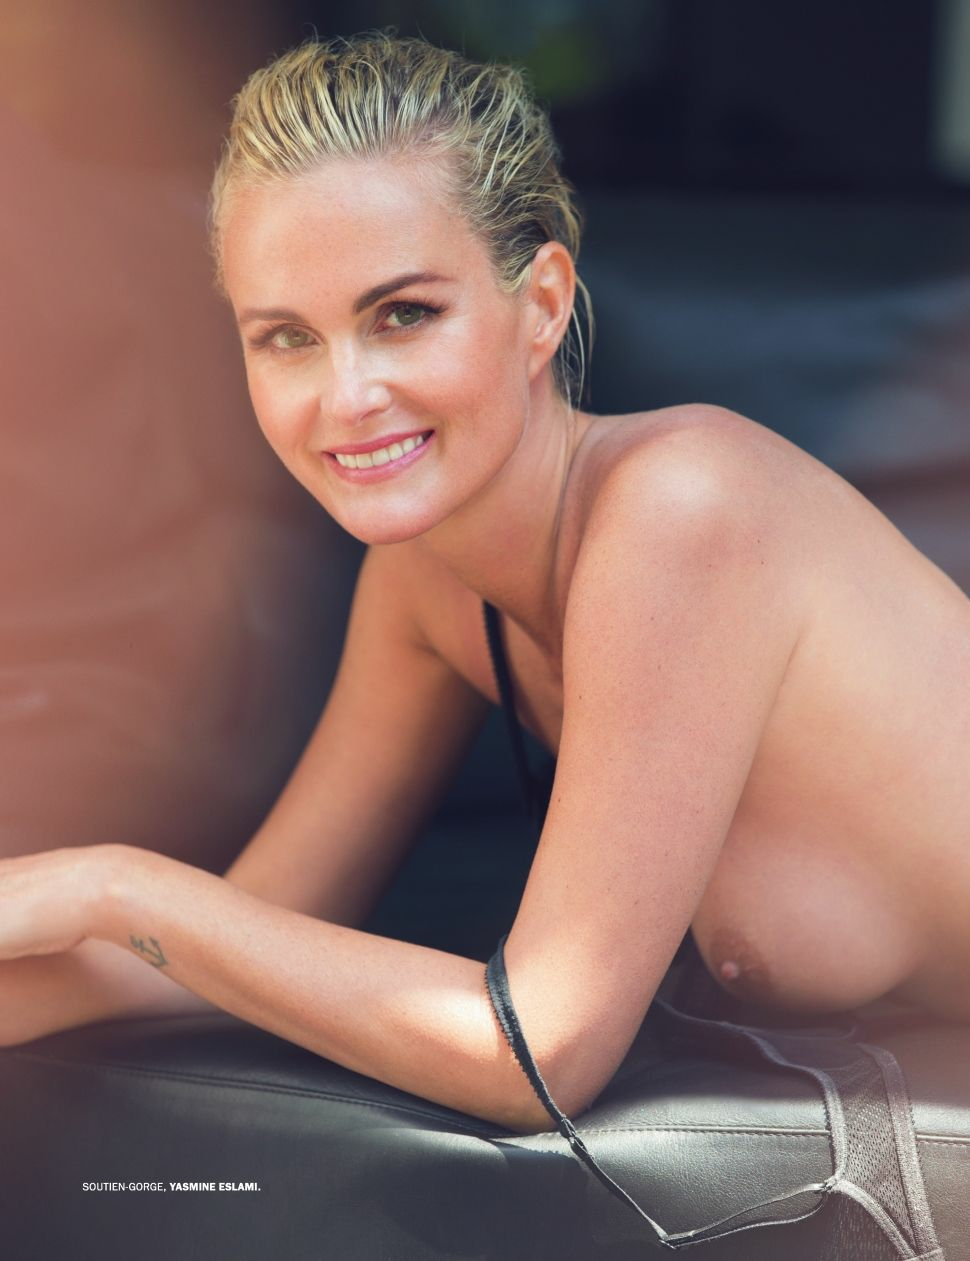 Wednesday addams lollipop tease naked (82 photos)